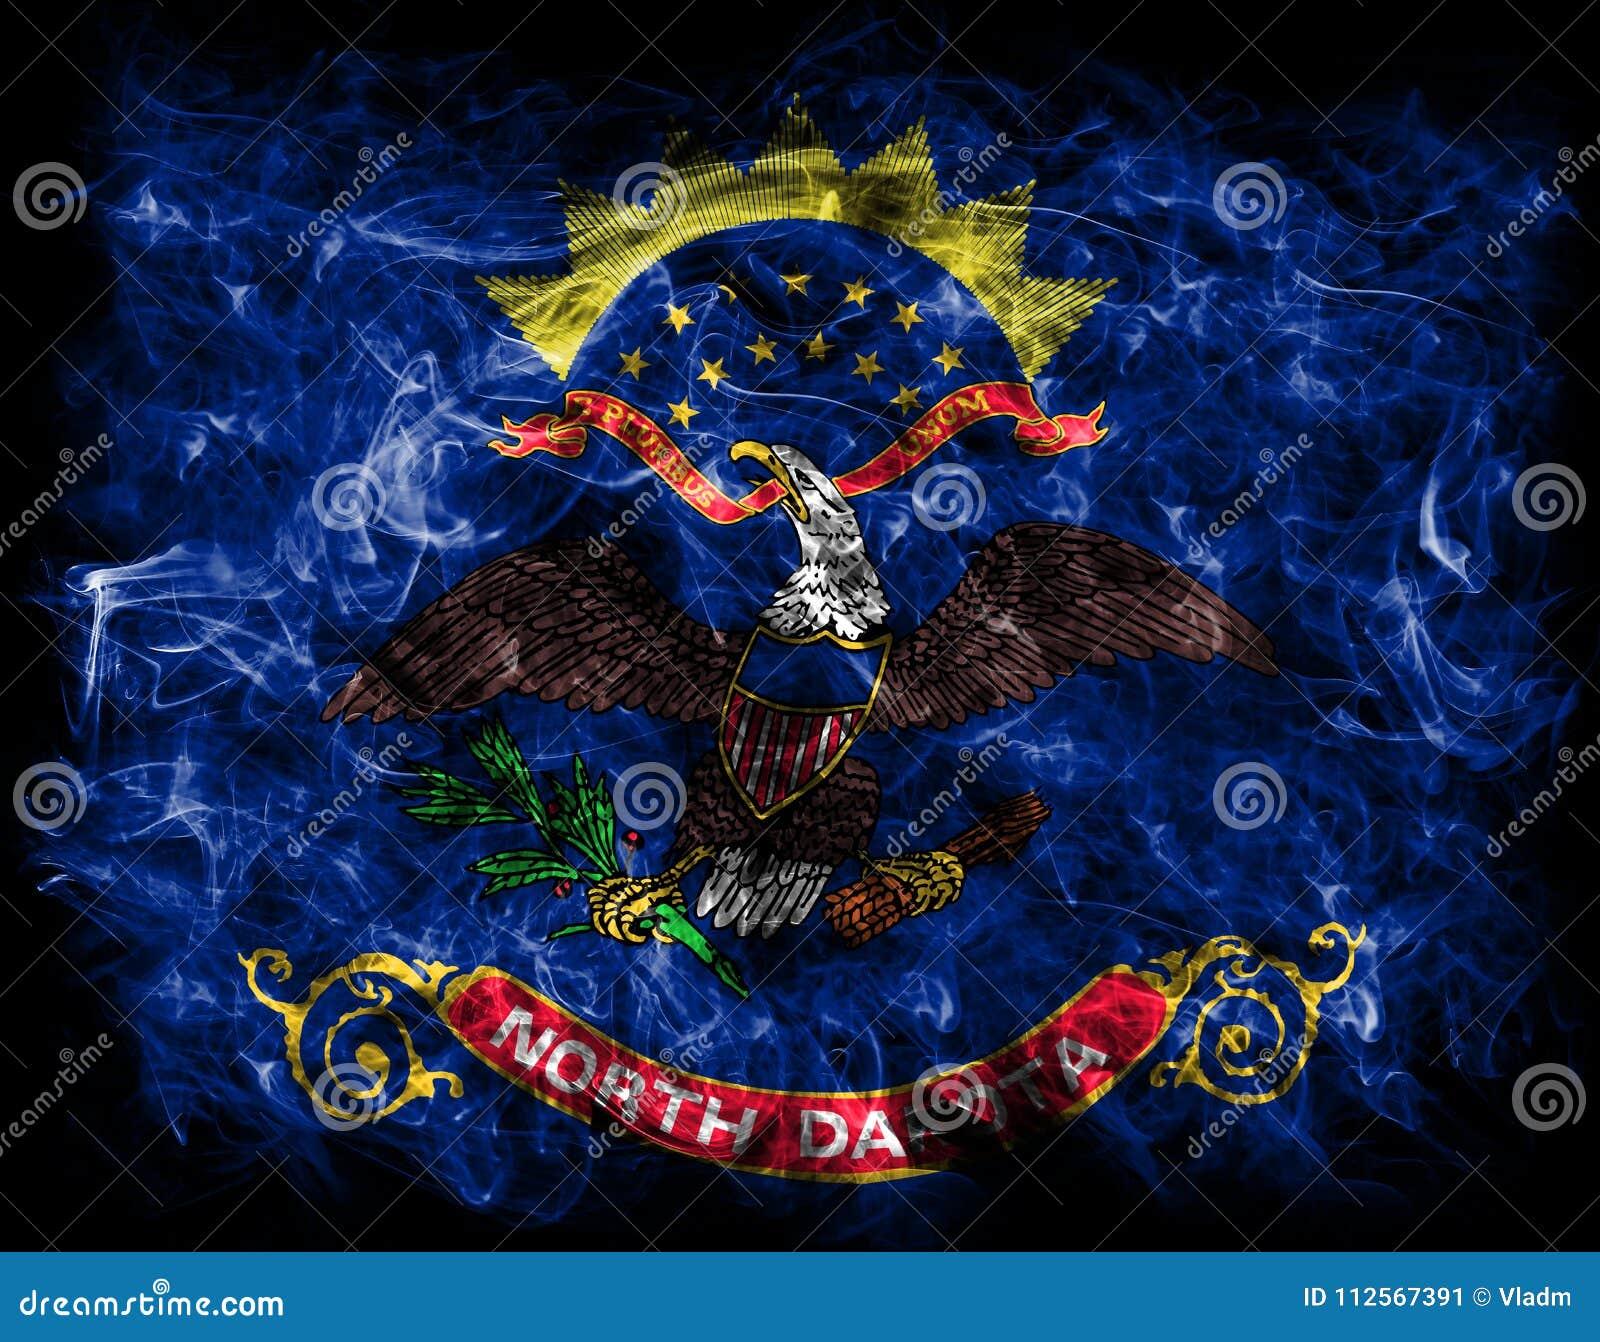 North Dakota State Smoke Flag United States Of America Stock Image